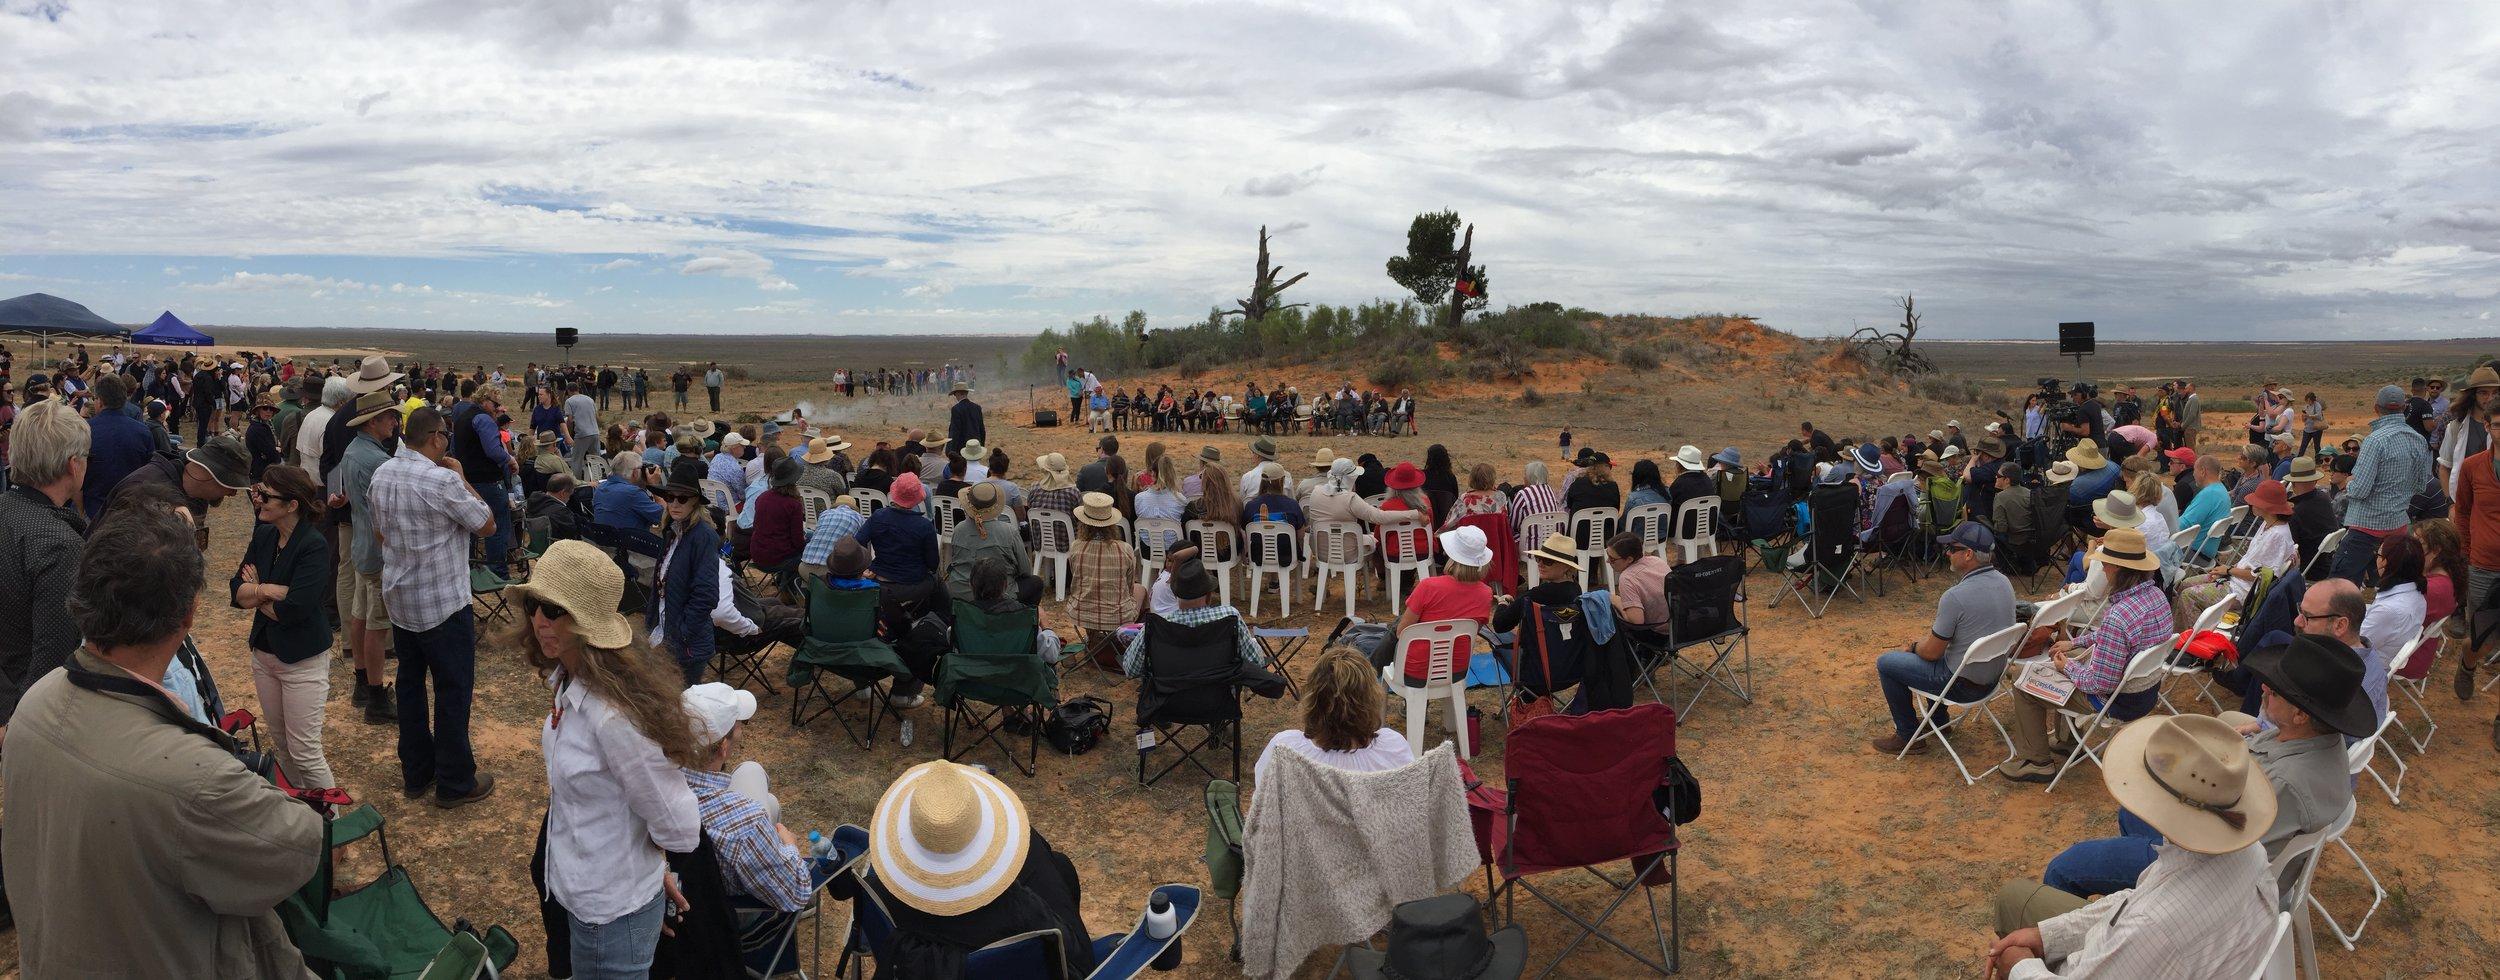 Returning ceremony at Lake Mungo (credit: Matthew Kneale)